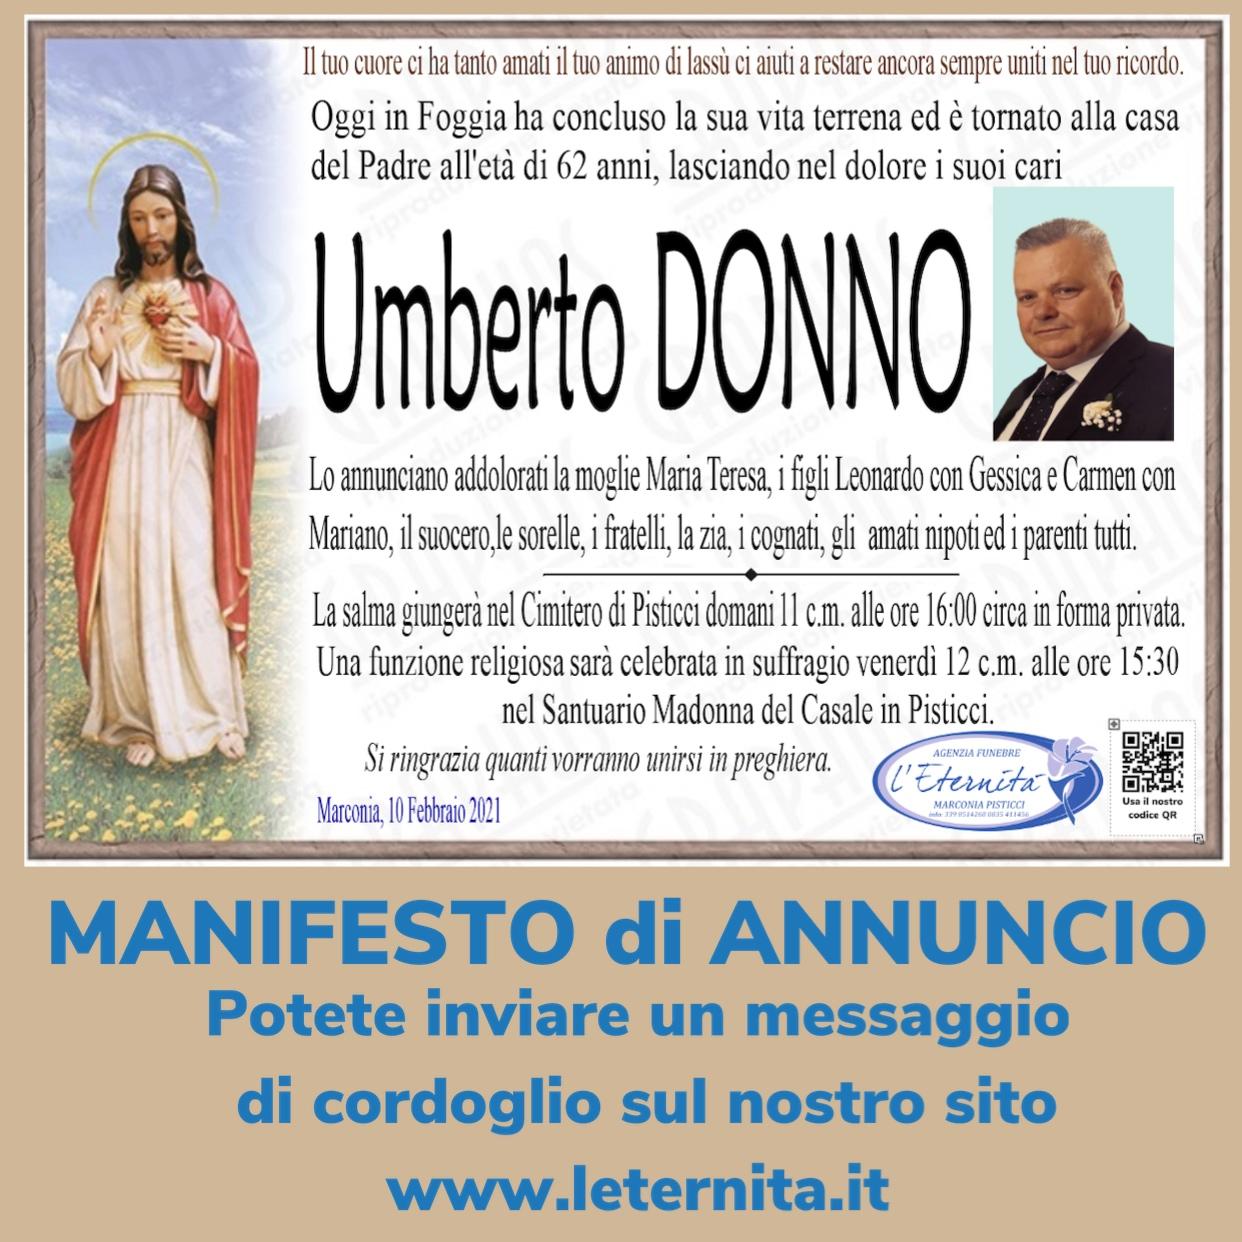 Umberto DONNO